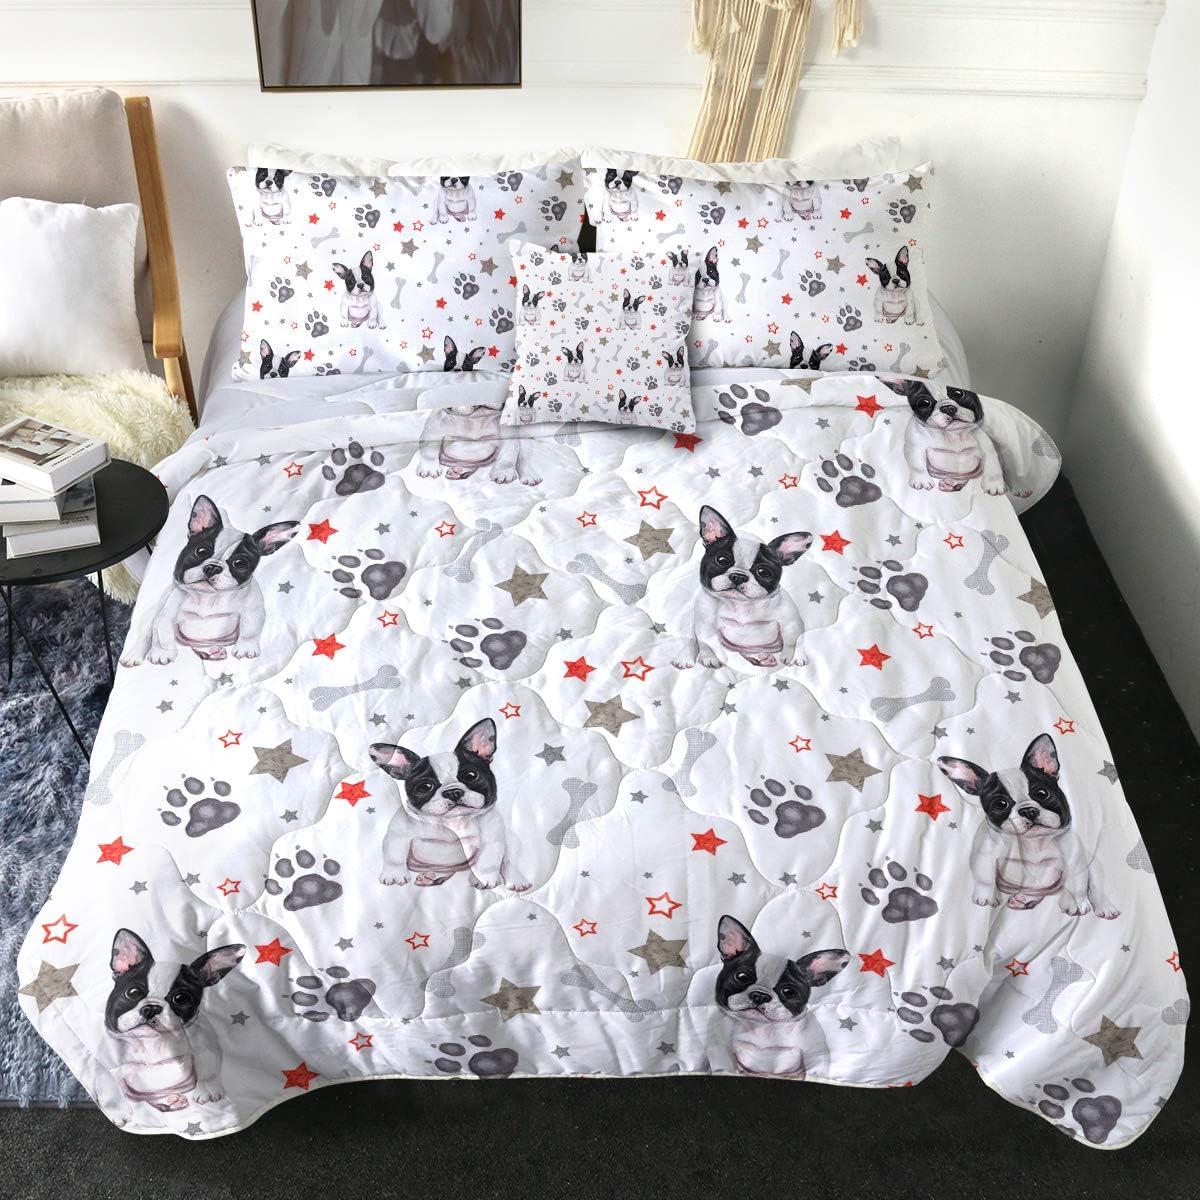 Financial sales sale Sleepwish 3D Animal French Bulldog Rare Print with Pi 2 Set Comforter